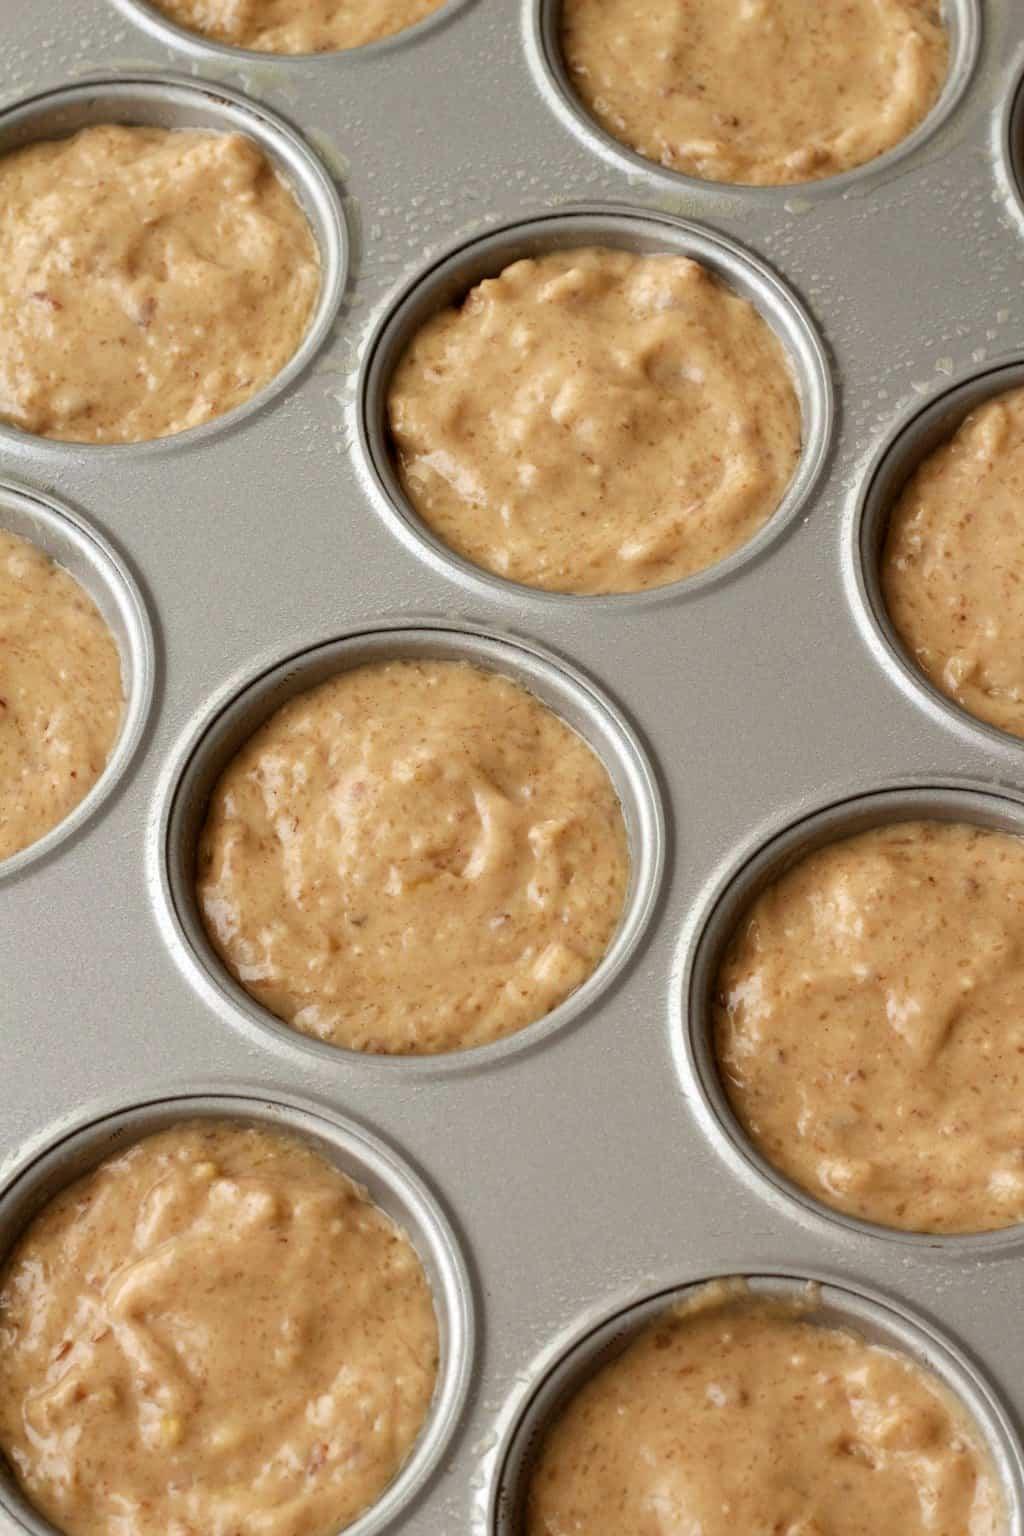 Making Banana Bread Muffins #vegan #lovingitvegan #bananabreadmuffins #muffins